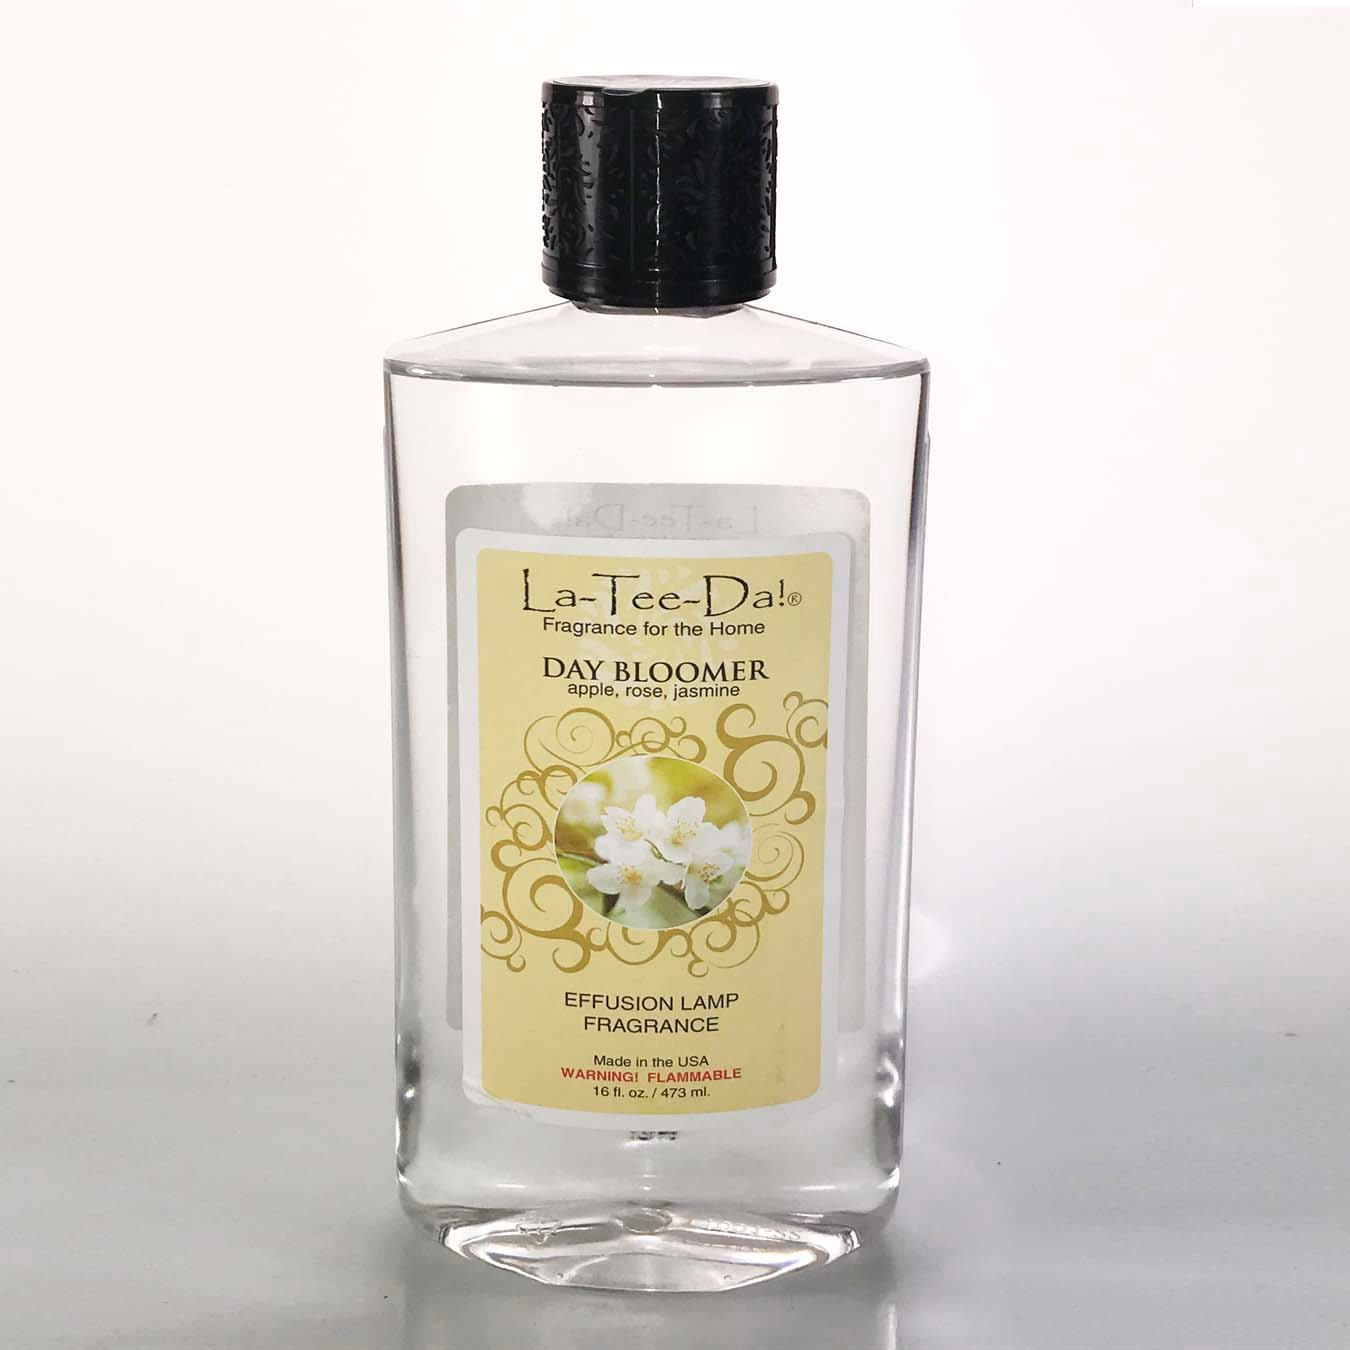 La Tee Da Fuel Fragrance Day Bloomer (16 oz.)